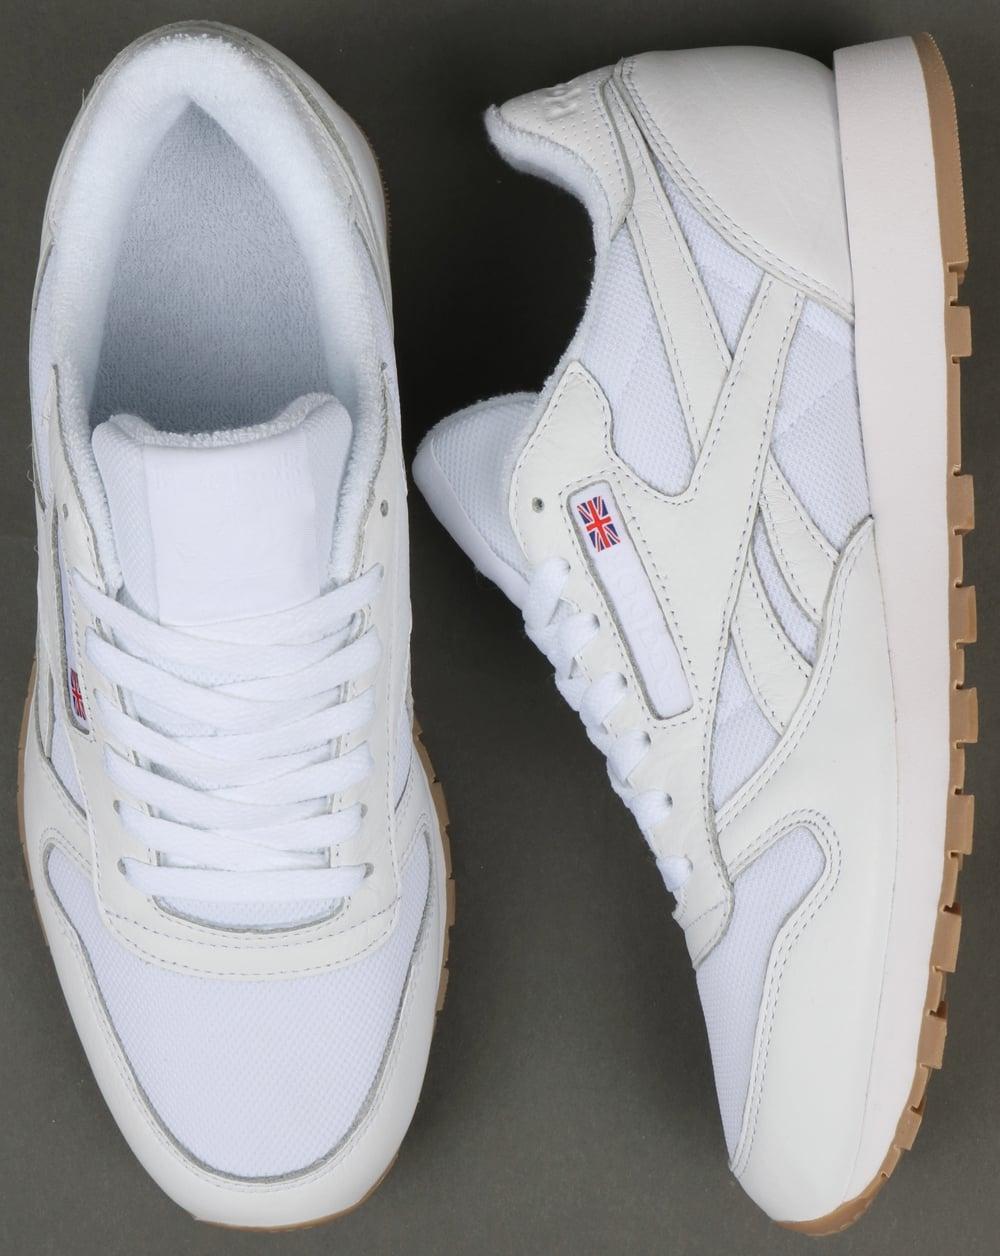 559d62328e22 promo code for mens reebok classic leather estl casual shoes 9fc4f 6cbef